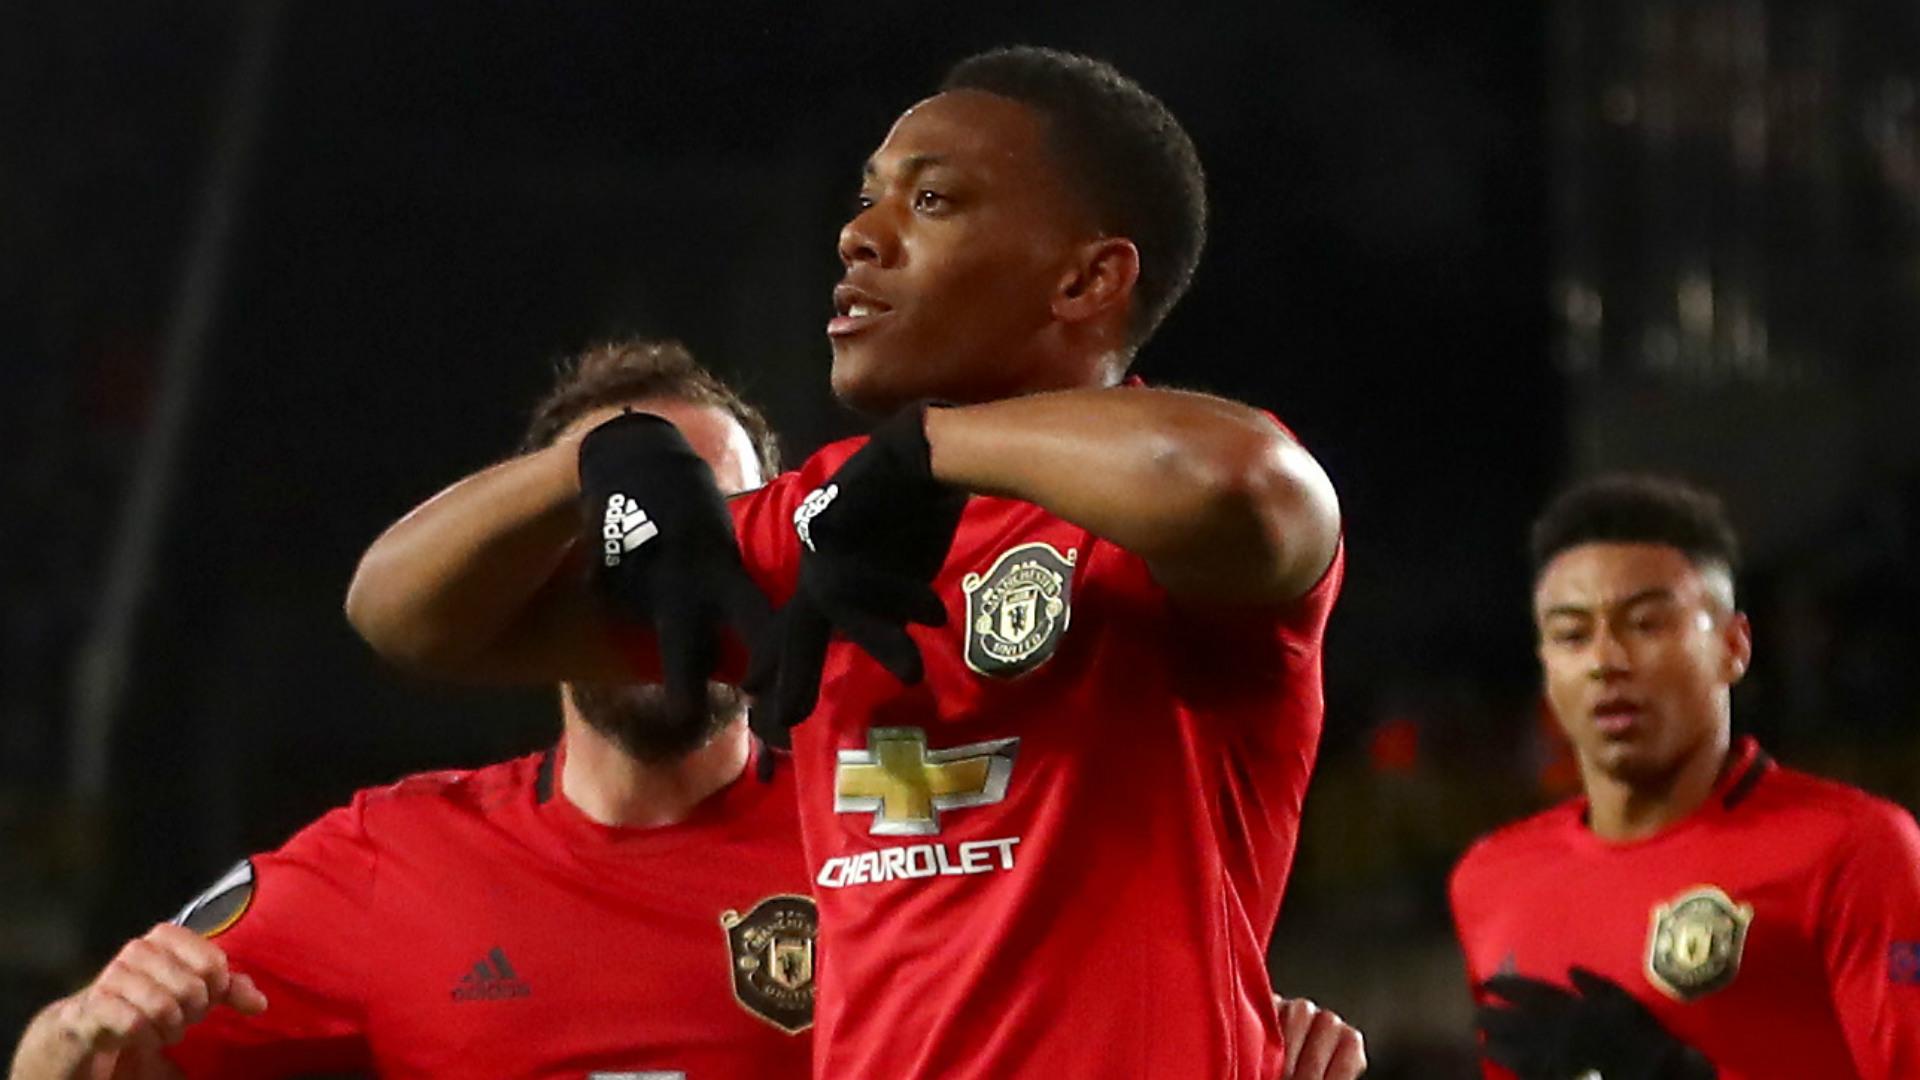 Laporan Pertandingan Club Brugge Vs Manchester United